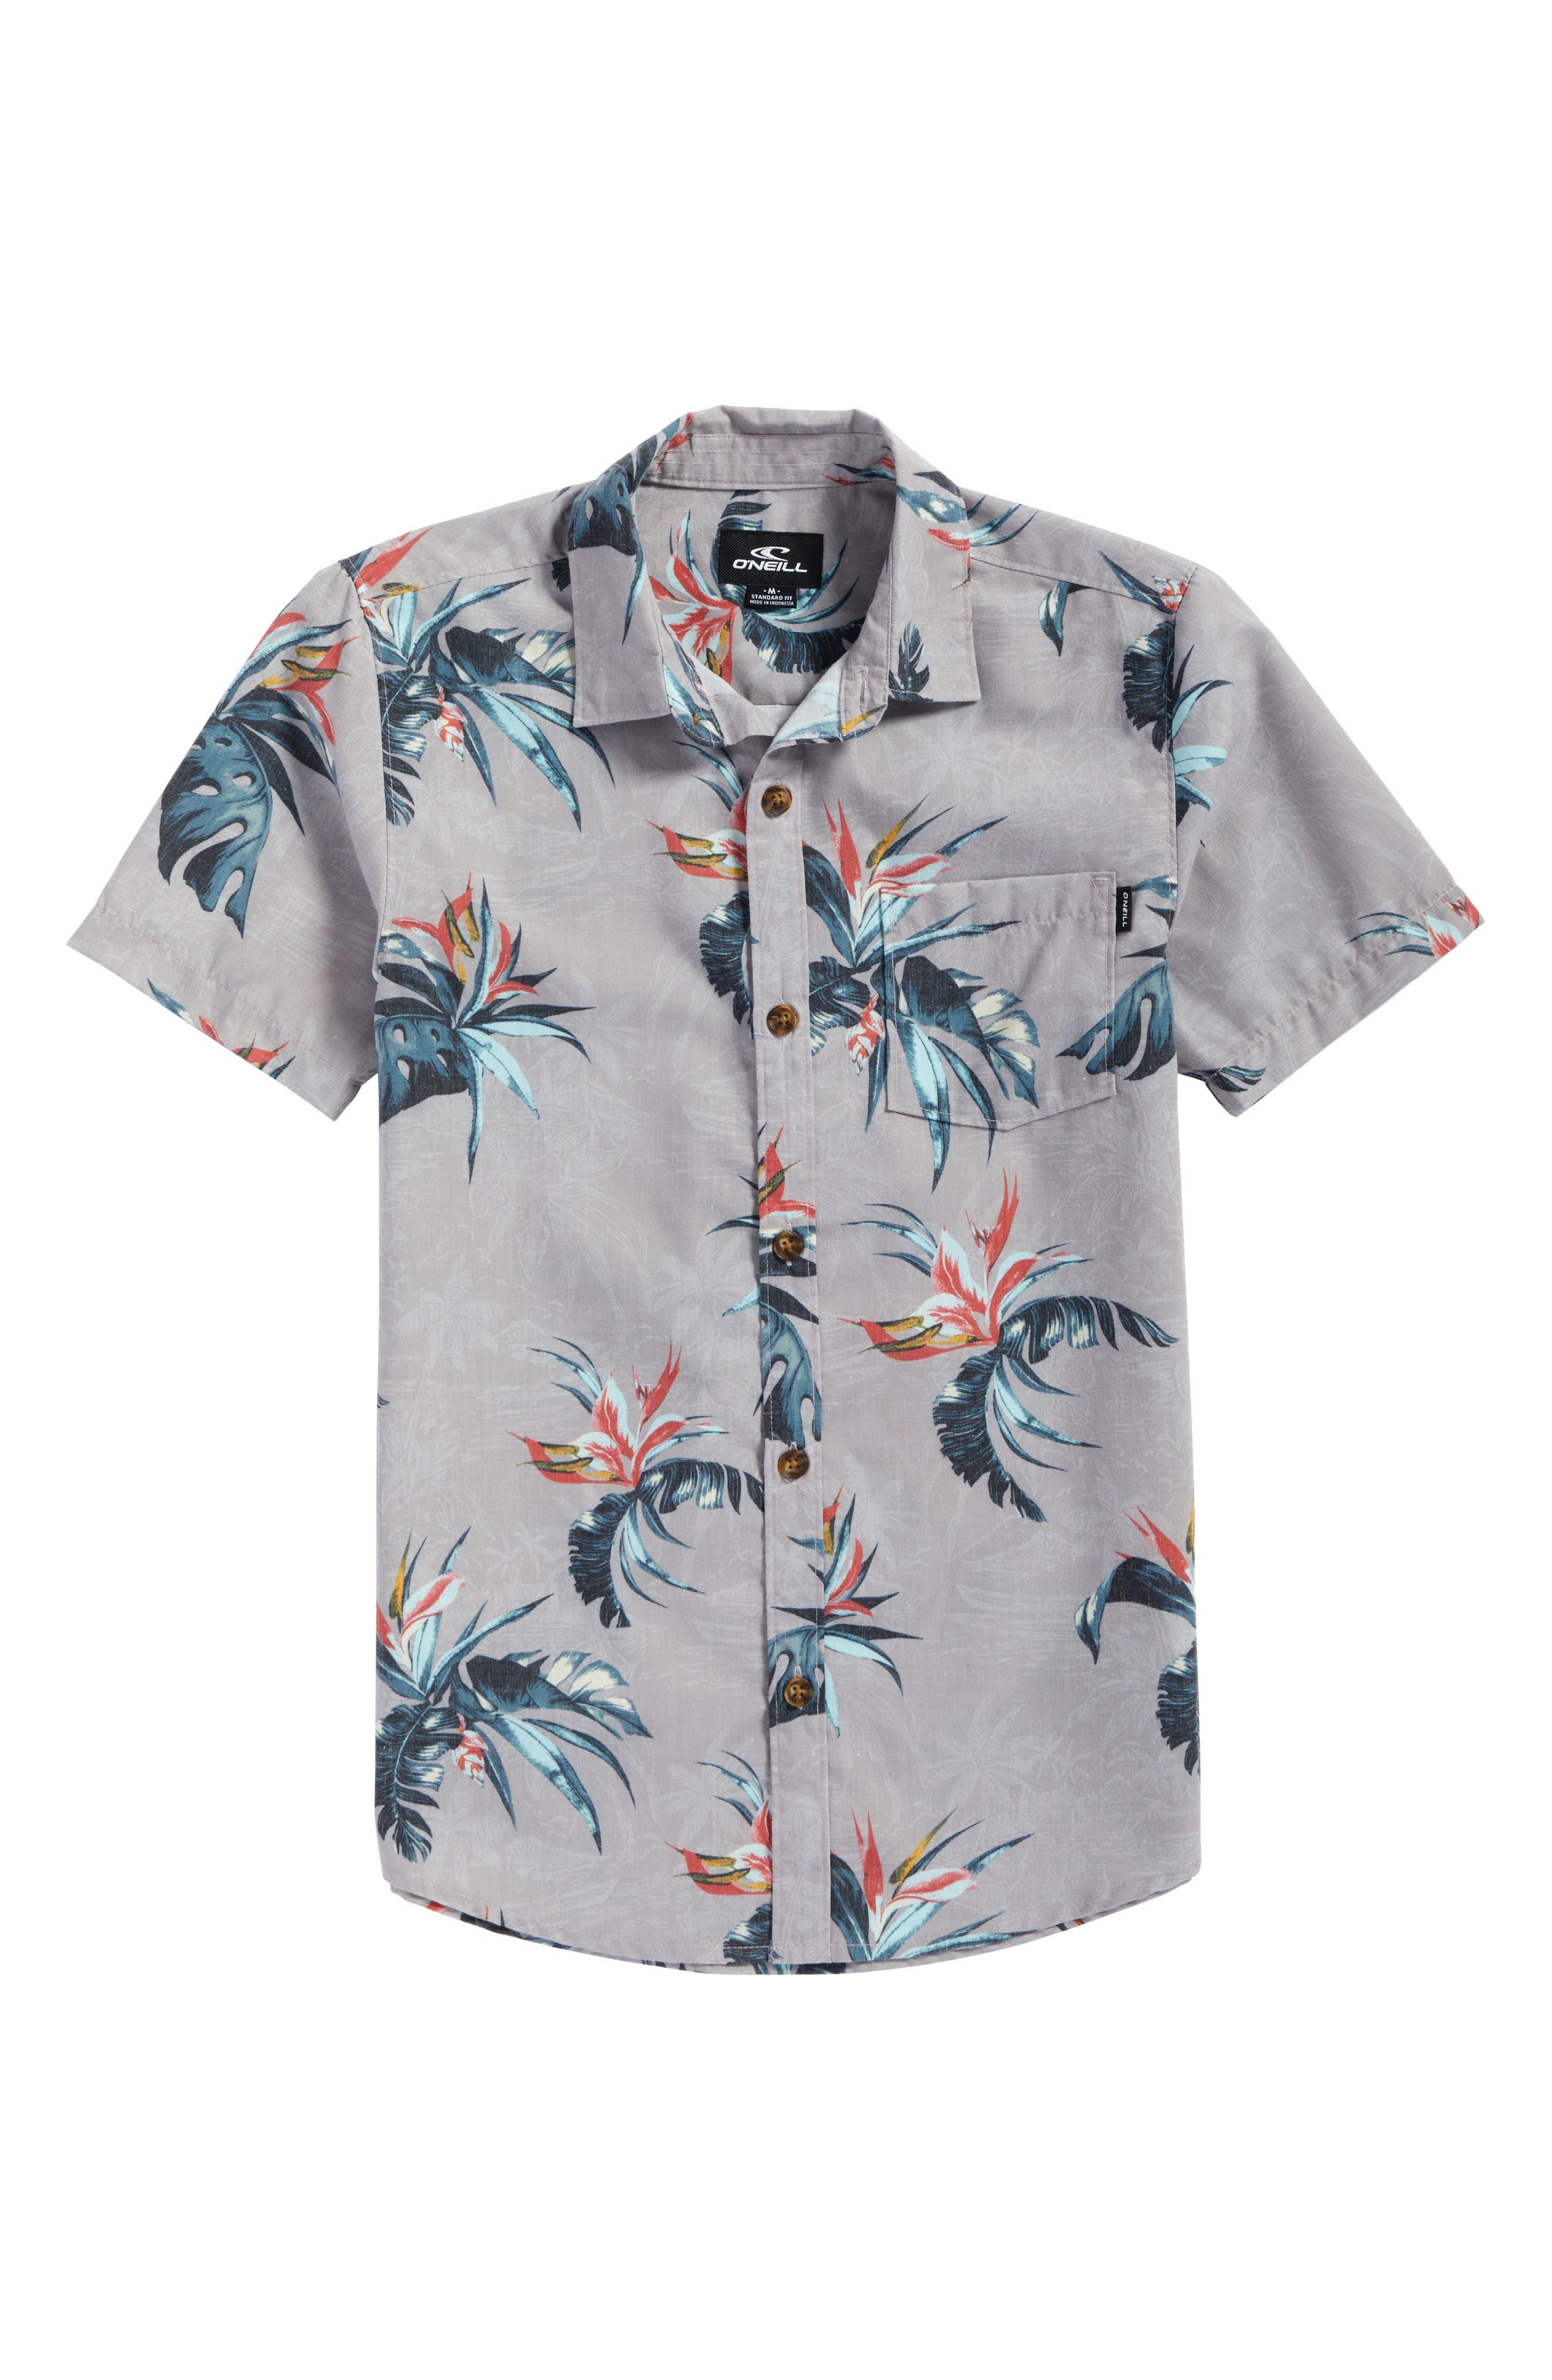 Alternate Image 1 Selected - O'Neill Islander Short Sleeve Shirt (Little Boys)